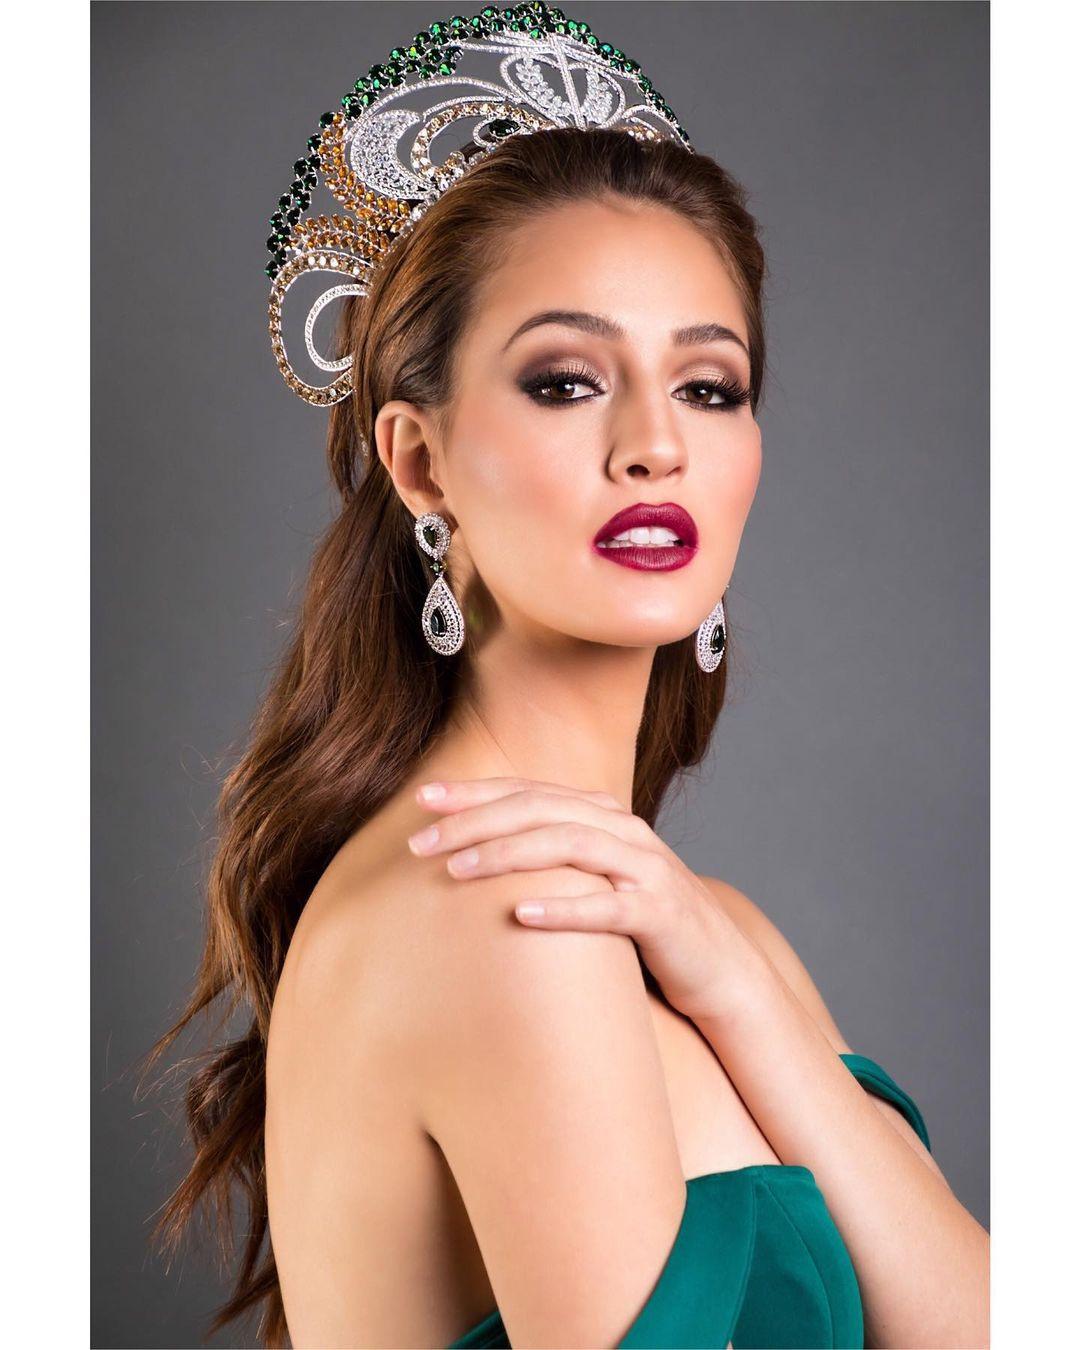 deise caroline ribas, top 10 de miss brasil mundo 2019/miss parana universo 2018/top 2 de miss teen international 2017. - Página 4 B8e7ps10